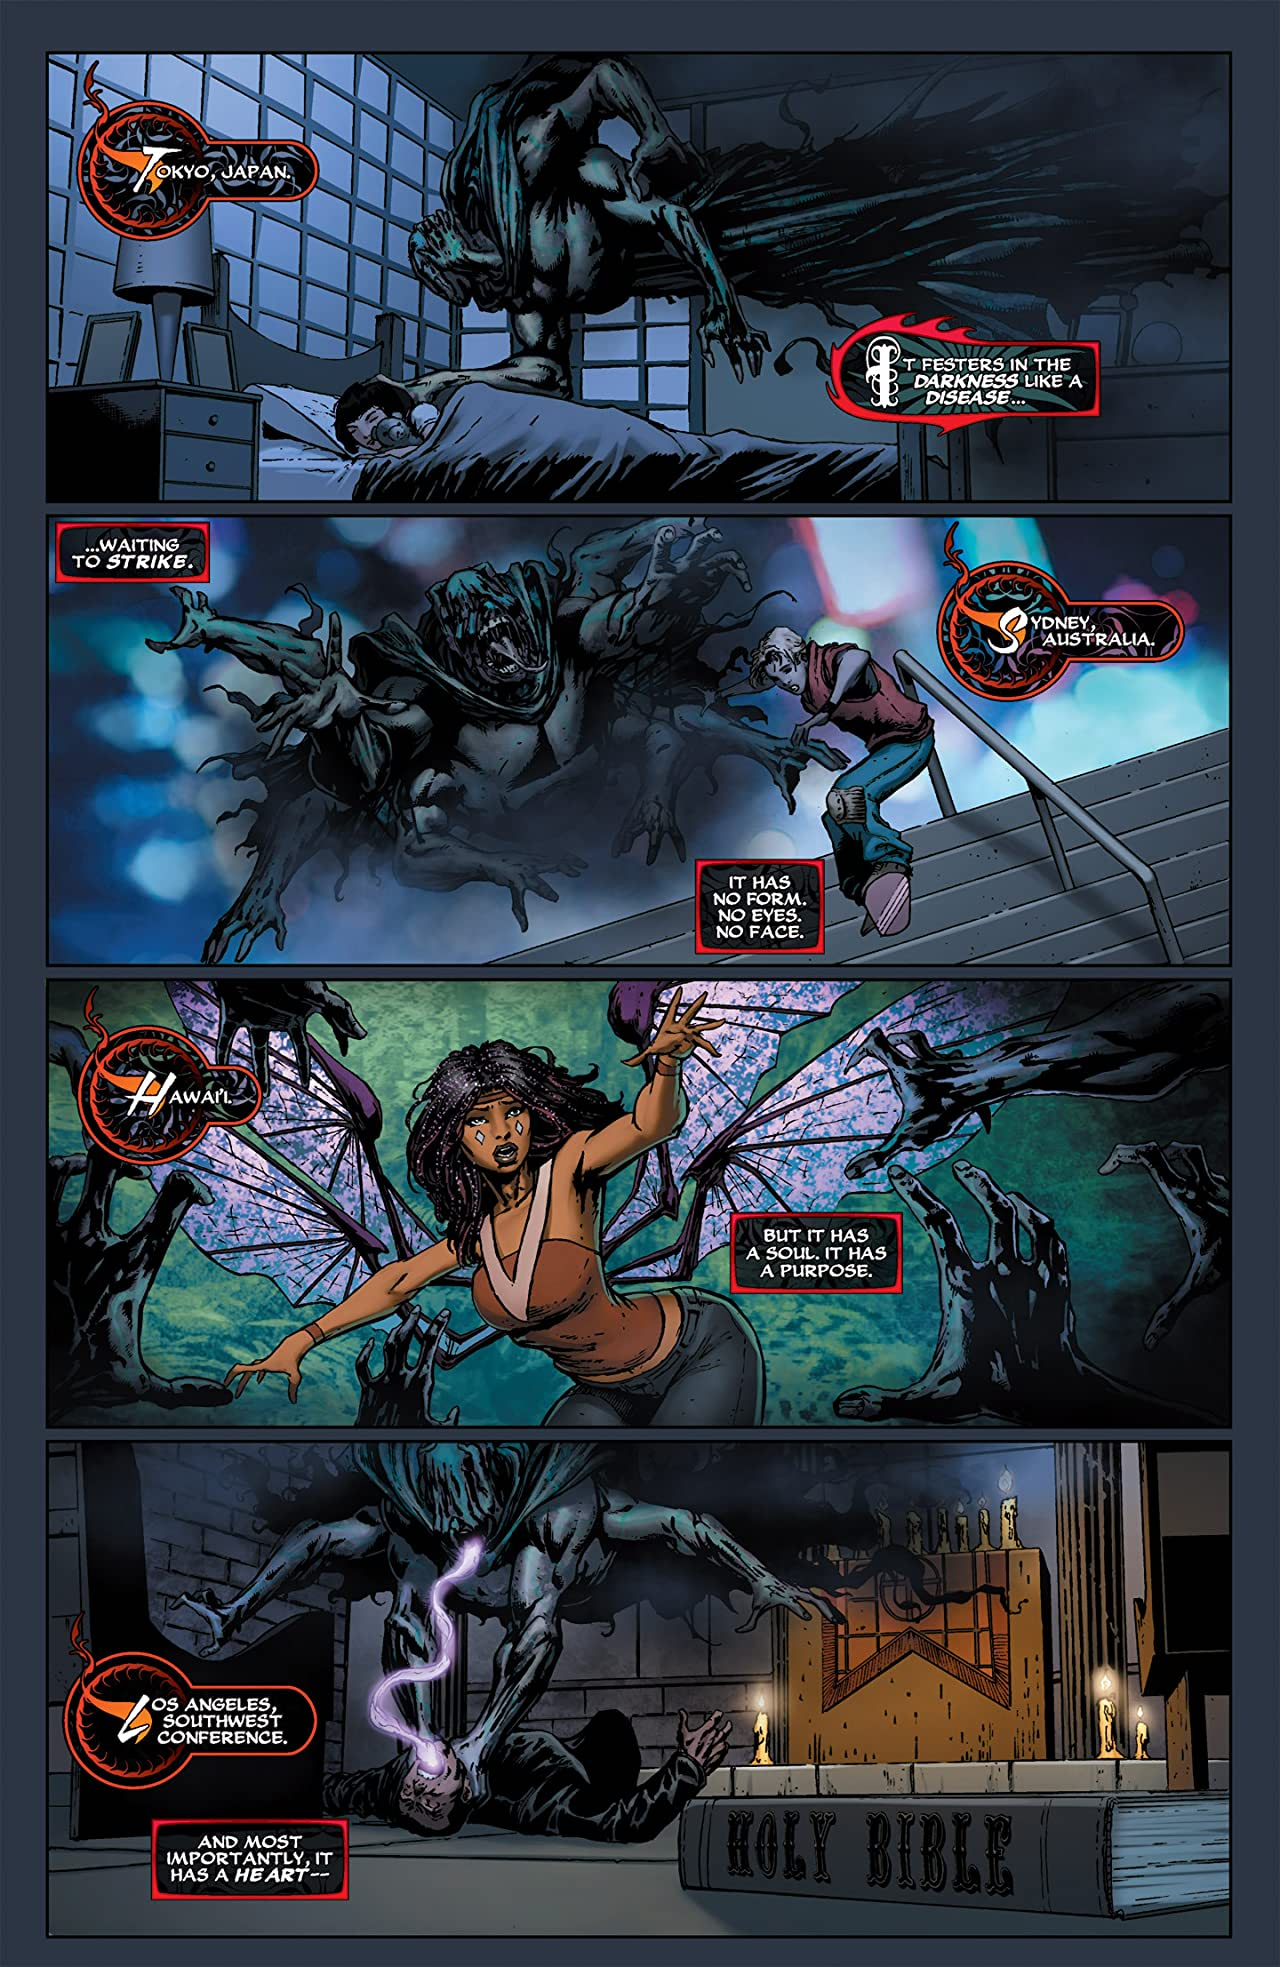 Soulfire Vol. 3 #3